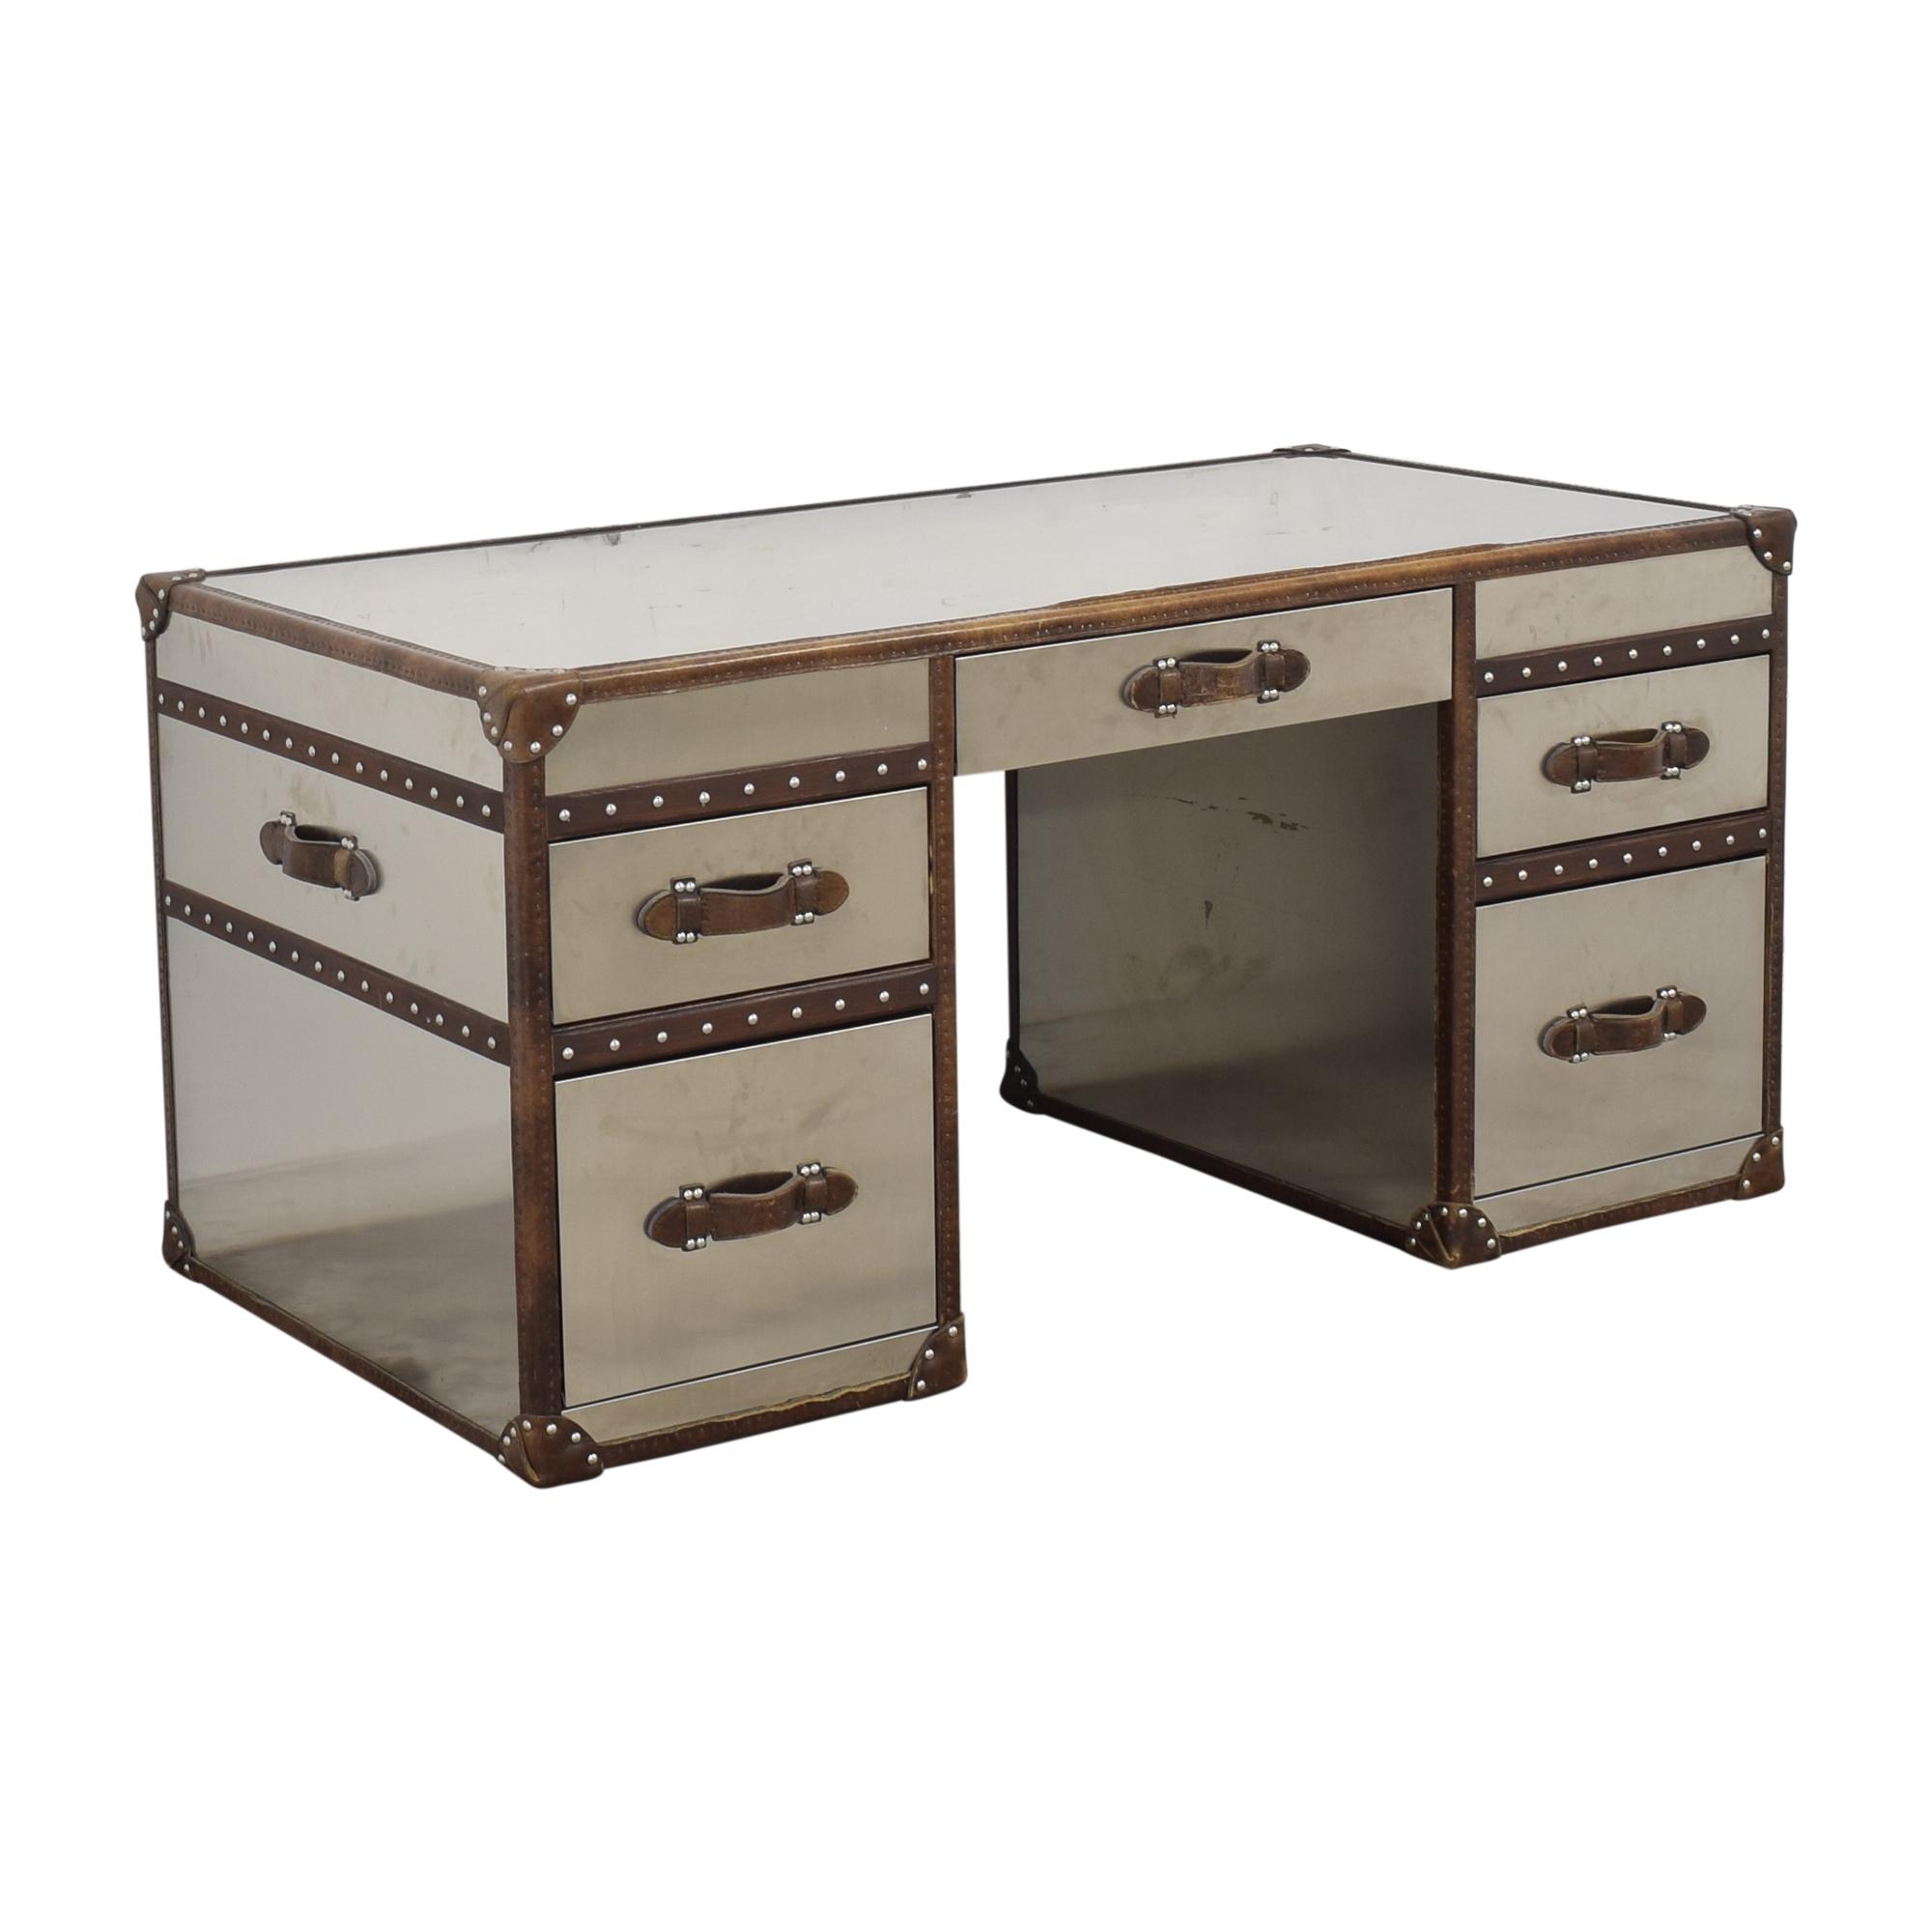 Restoration Hardware Restoration Hardware Mayfair Streamer Trunk Desk on sale